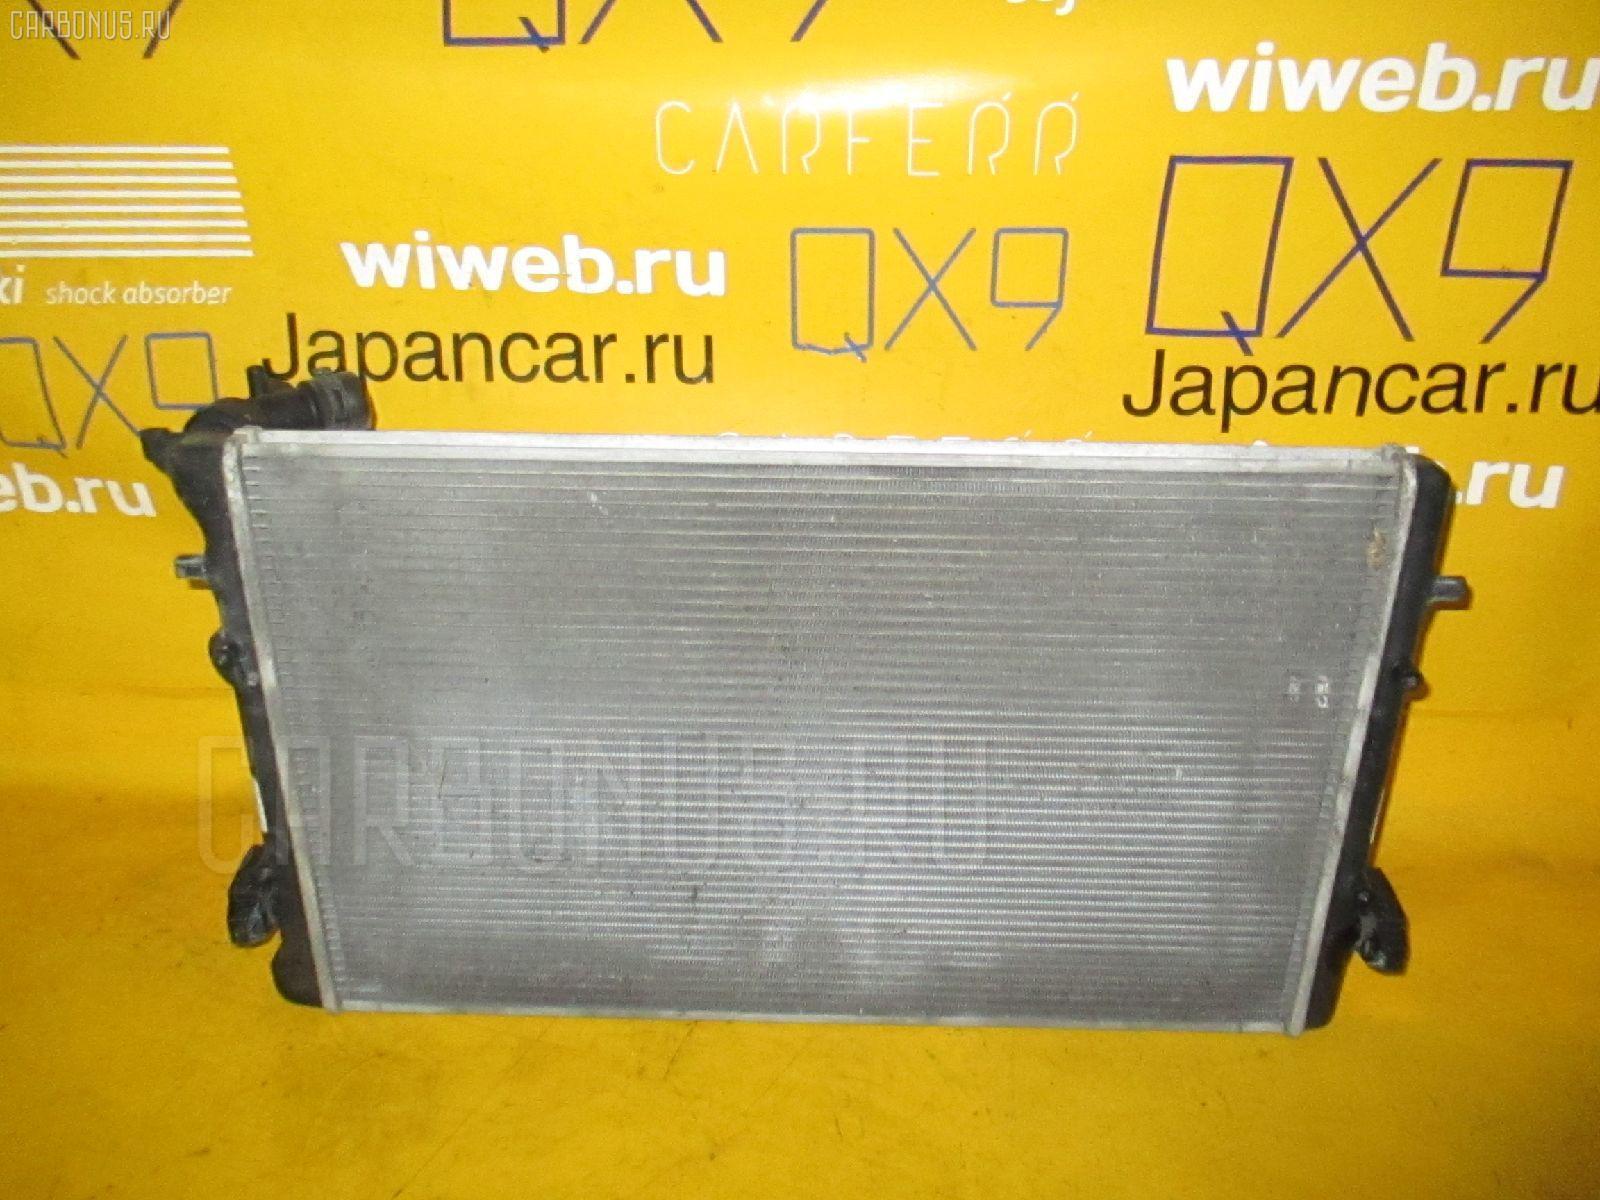 Радиатор ДВС AUDI A3 8LAGN AGN. Фото 8